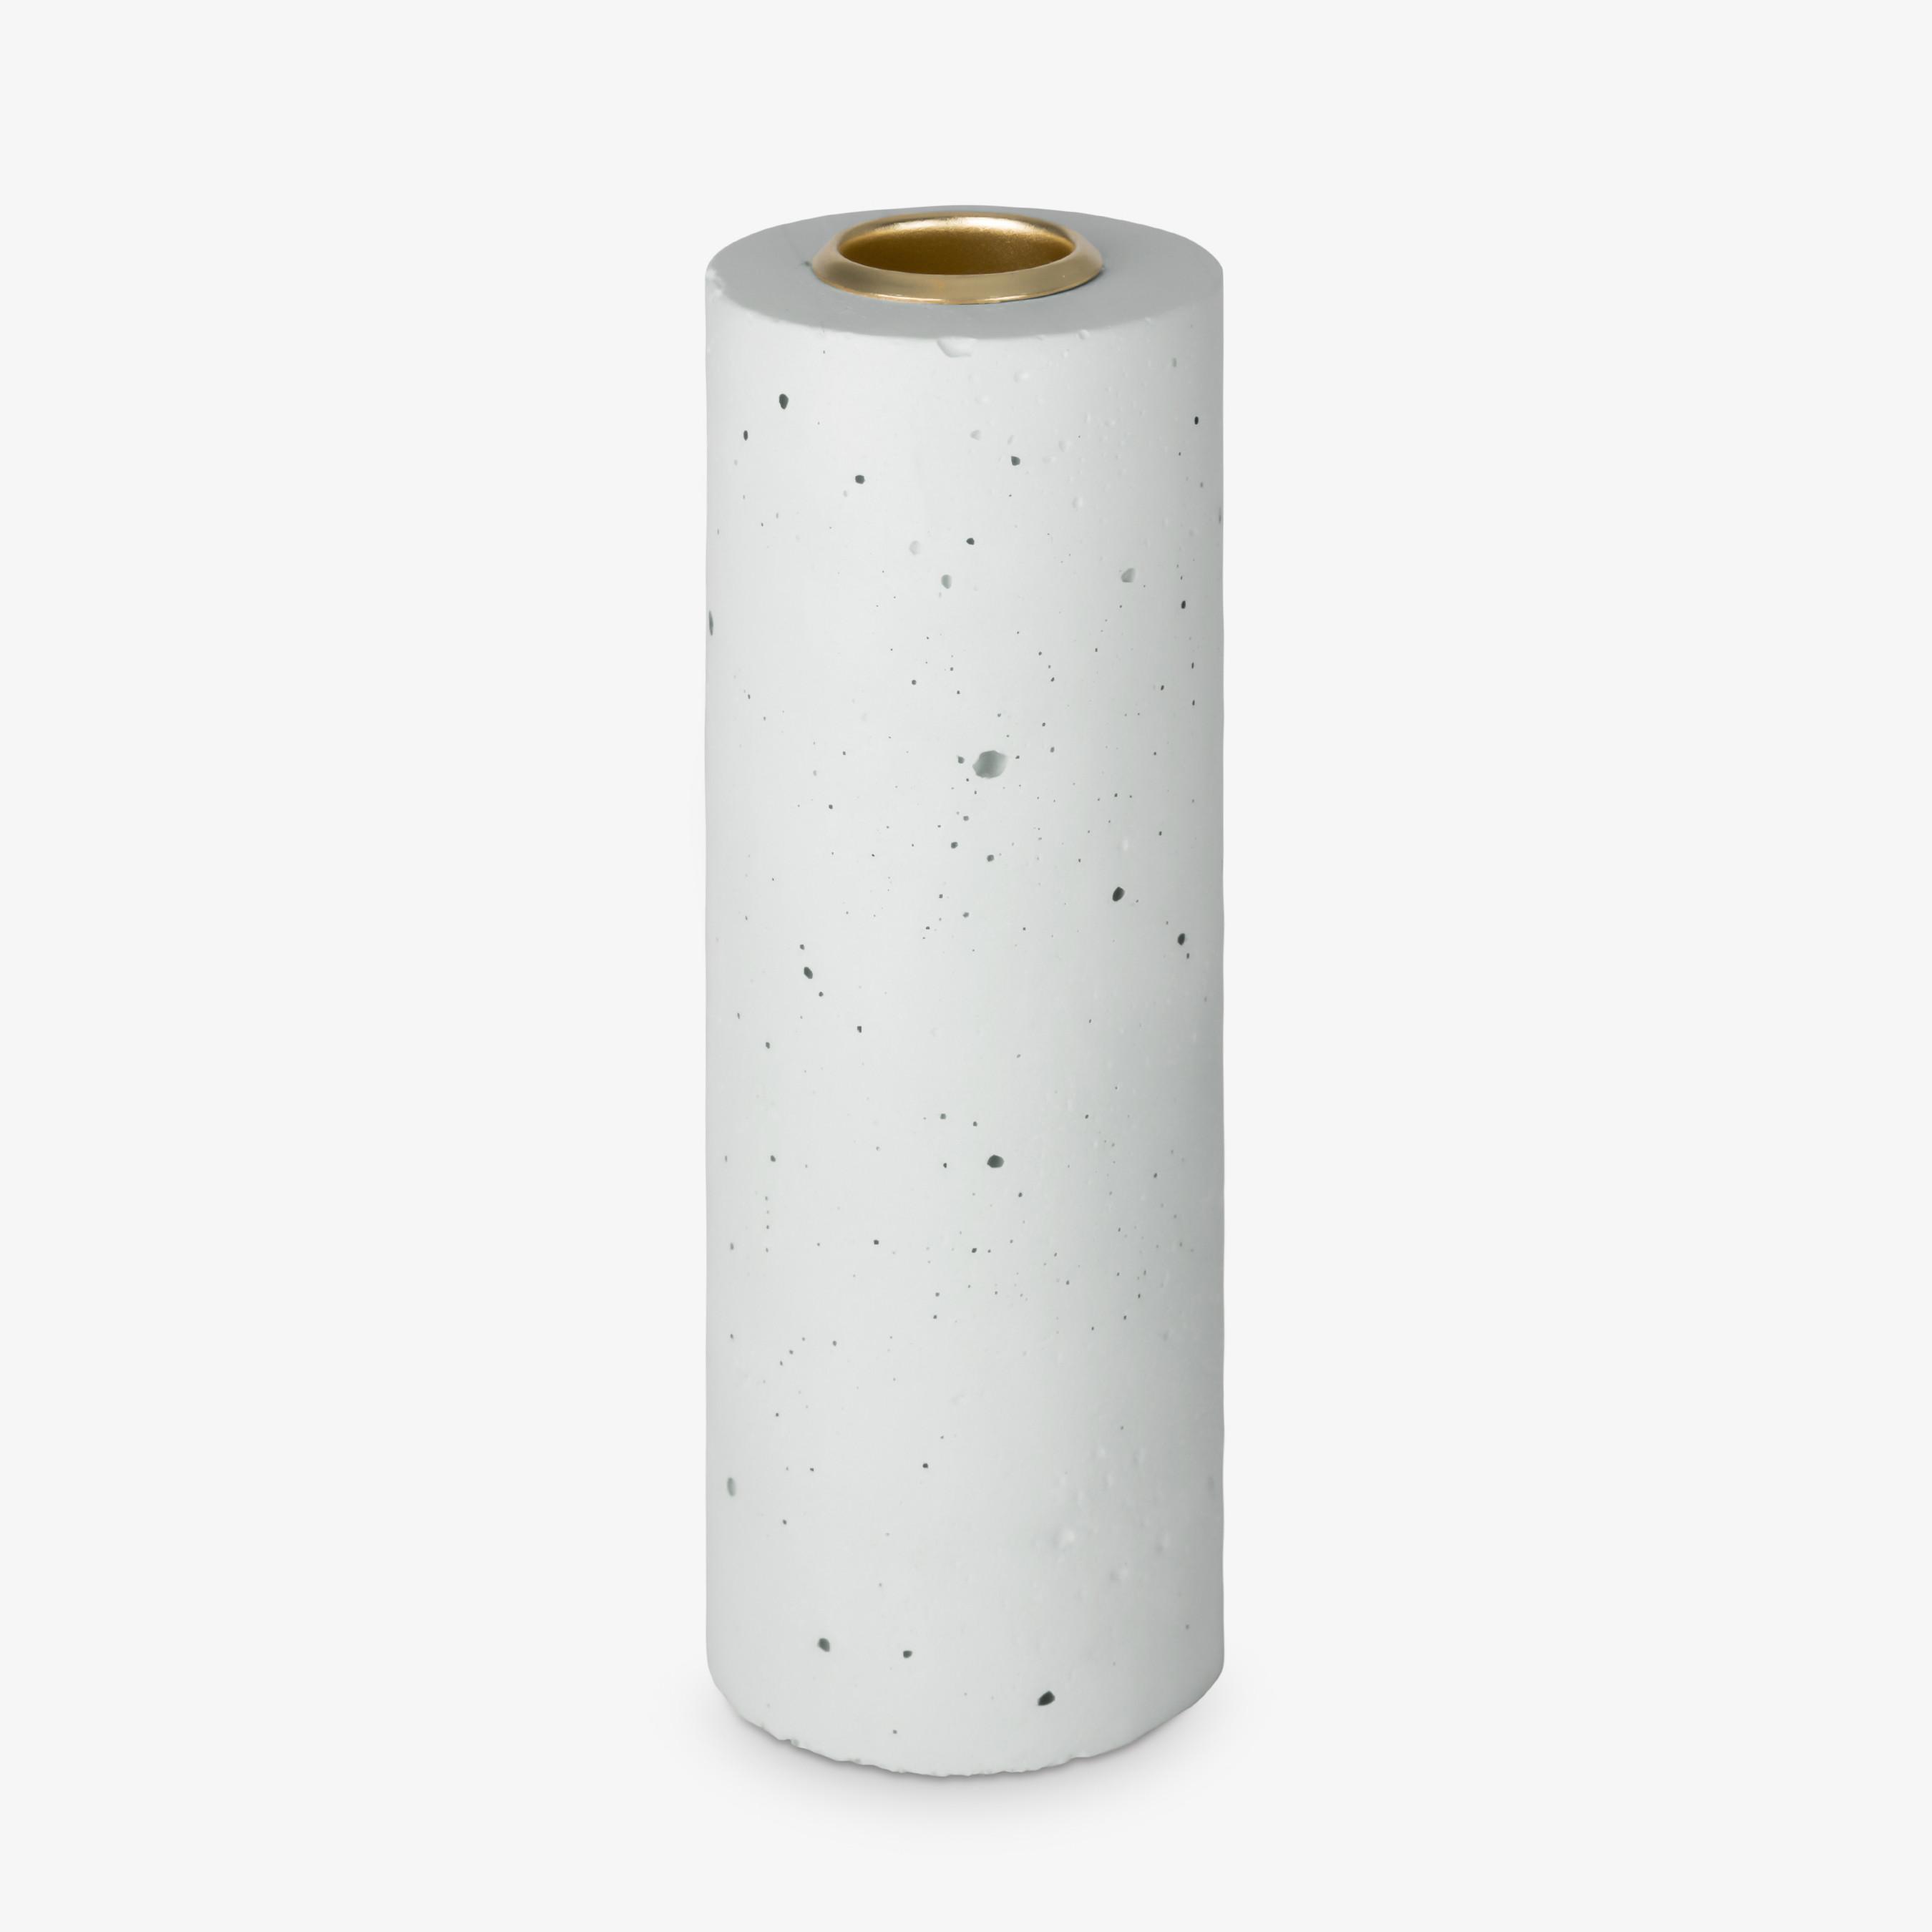 Candle Stick Tower 15x5 cm   Pastel Mint